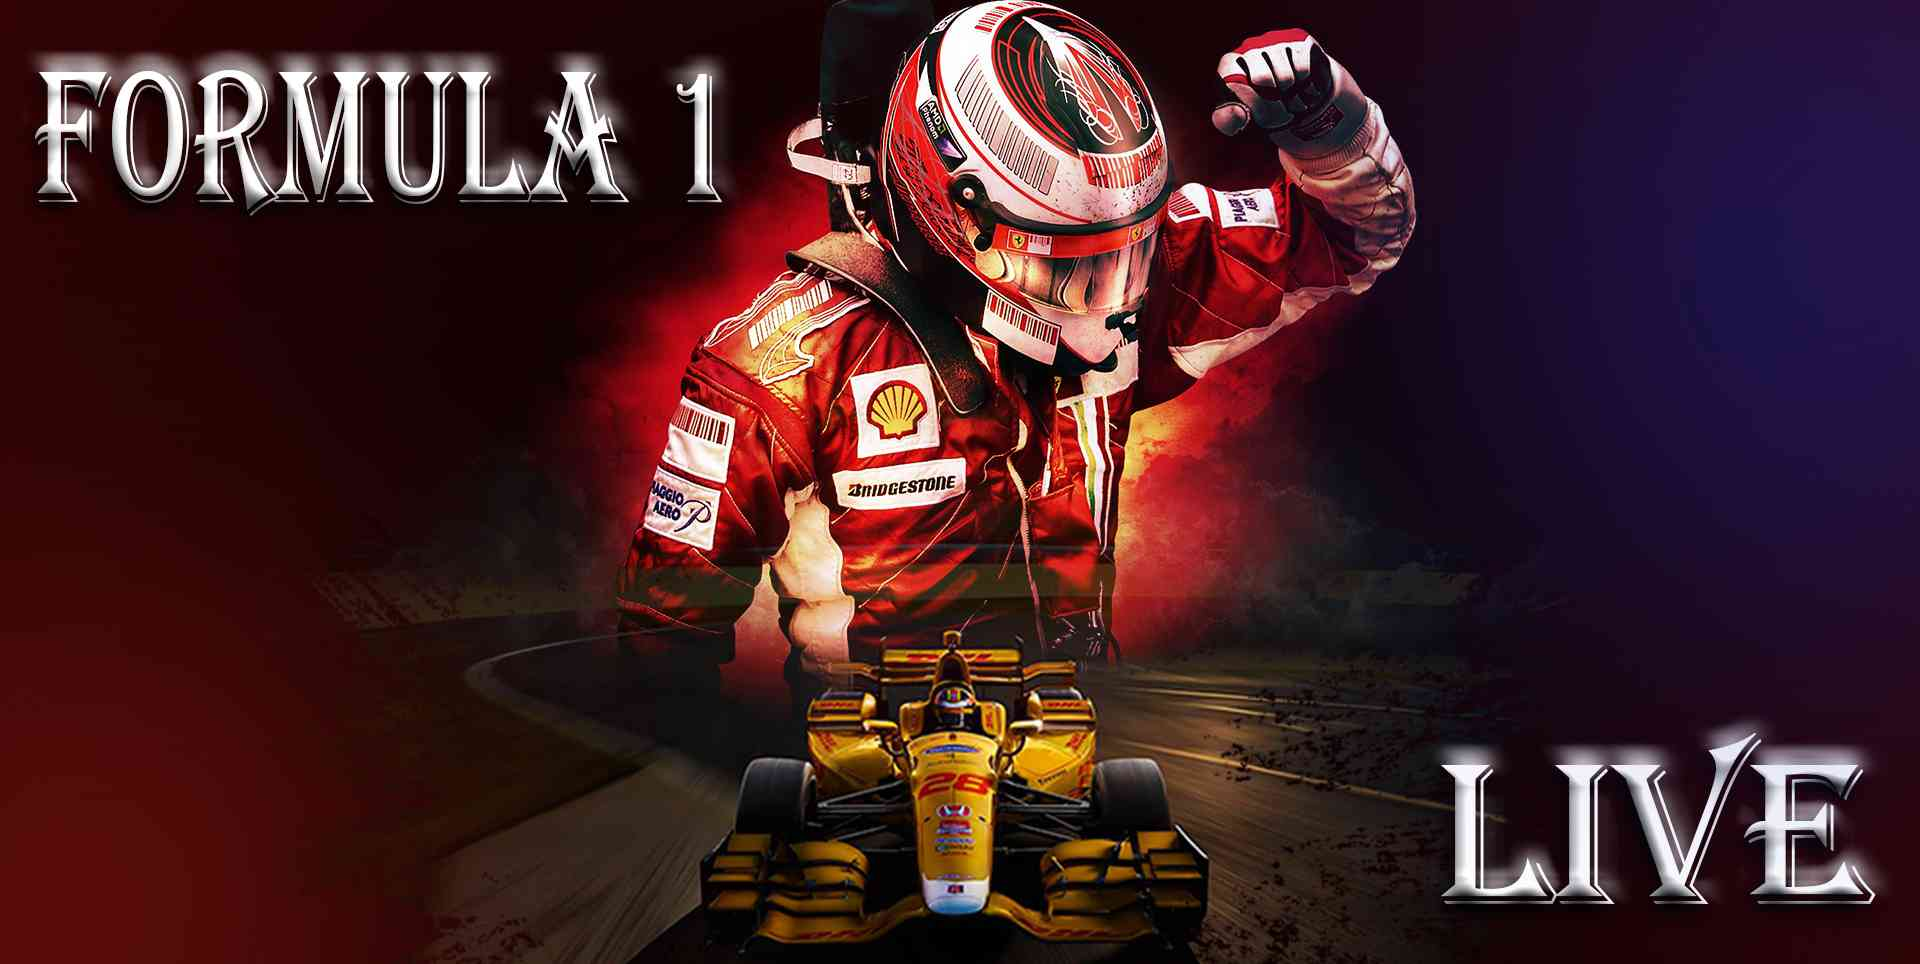 Russian GP f1 2016 Live